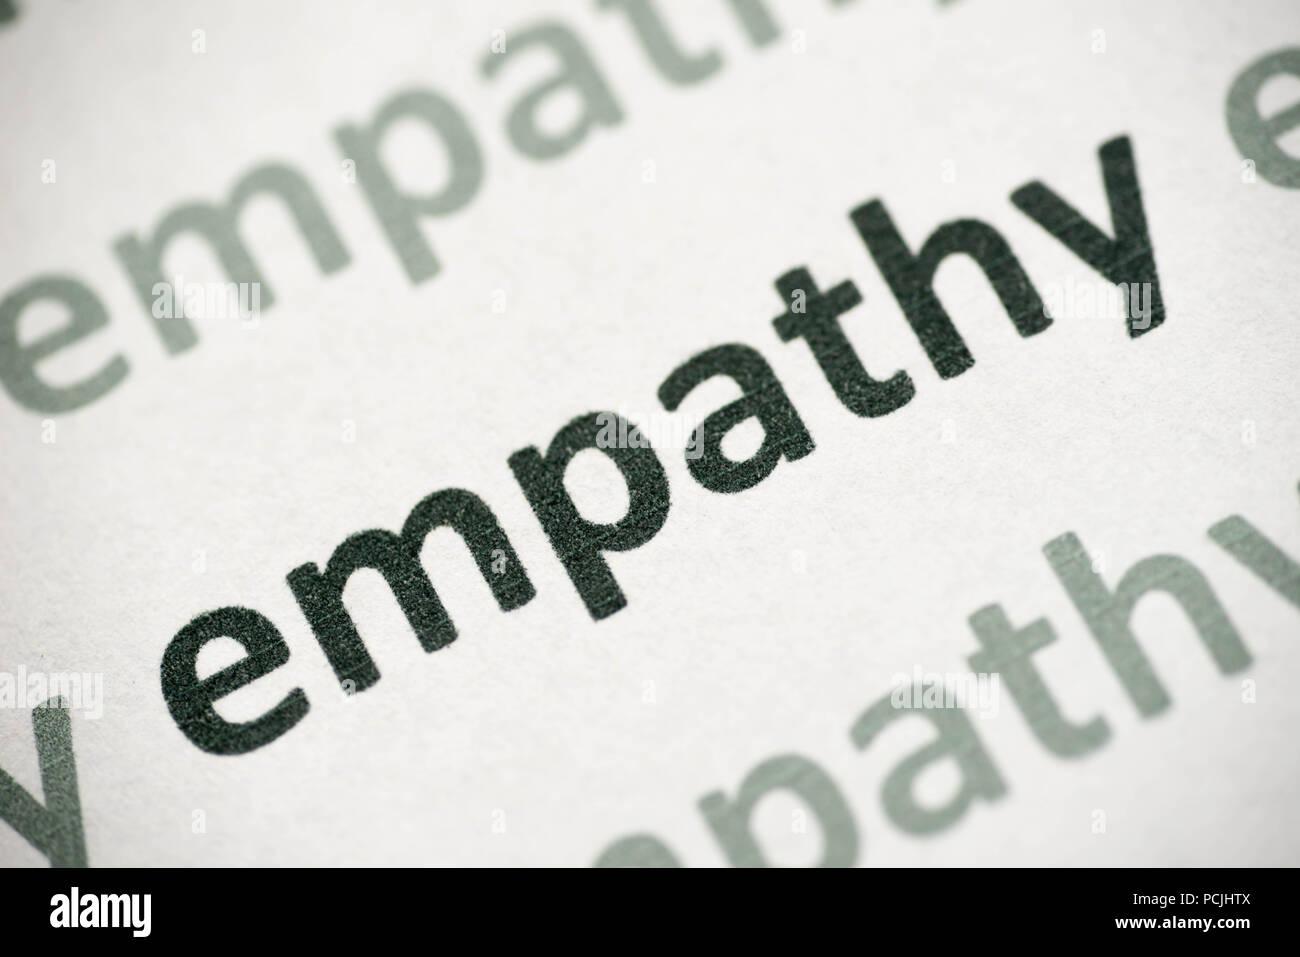 Palabra empatía impreso en papel blanco macro Imagen De Stock